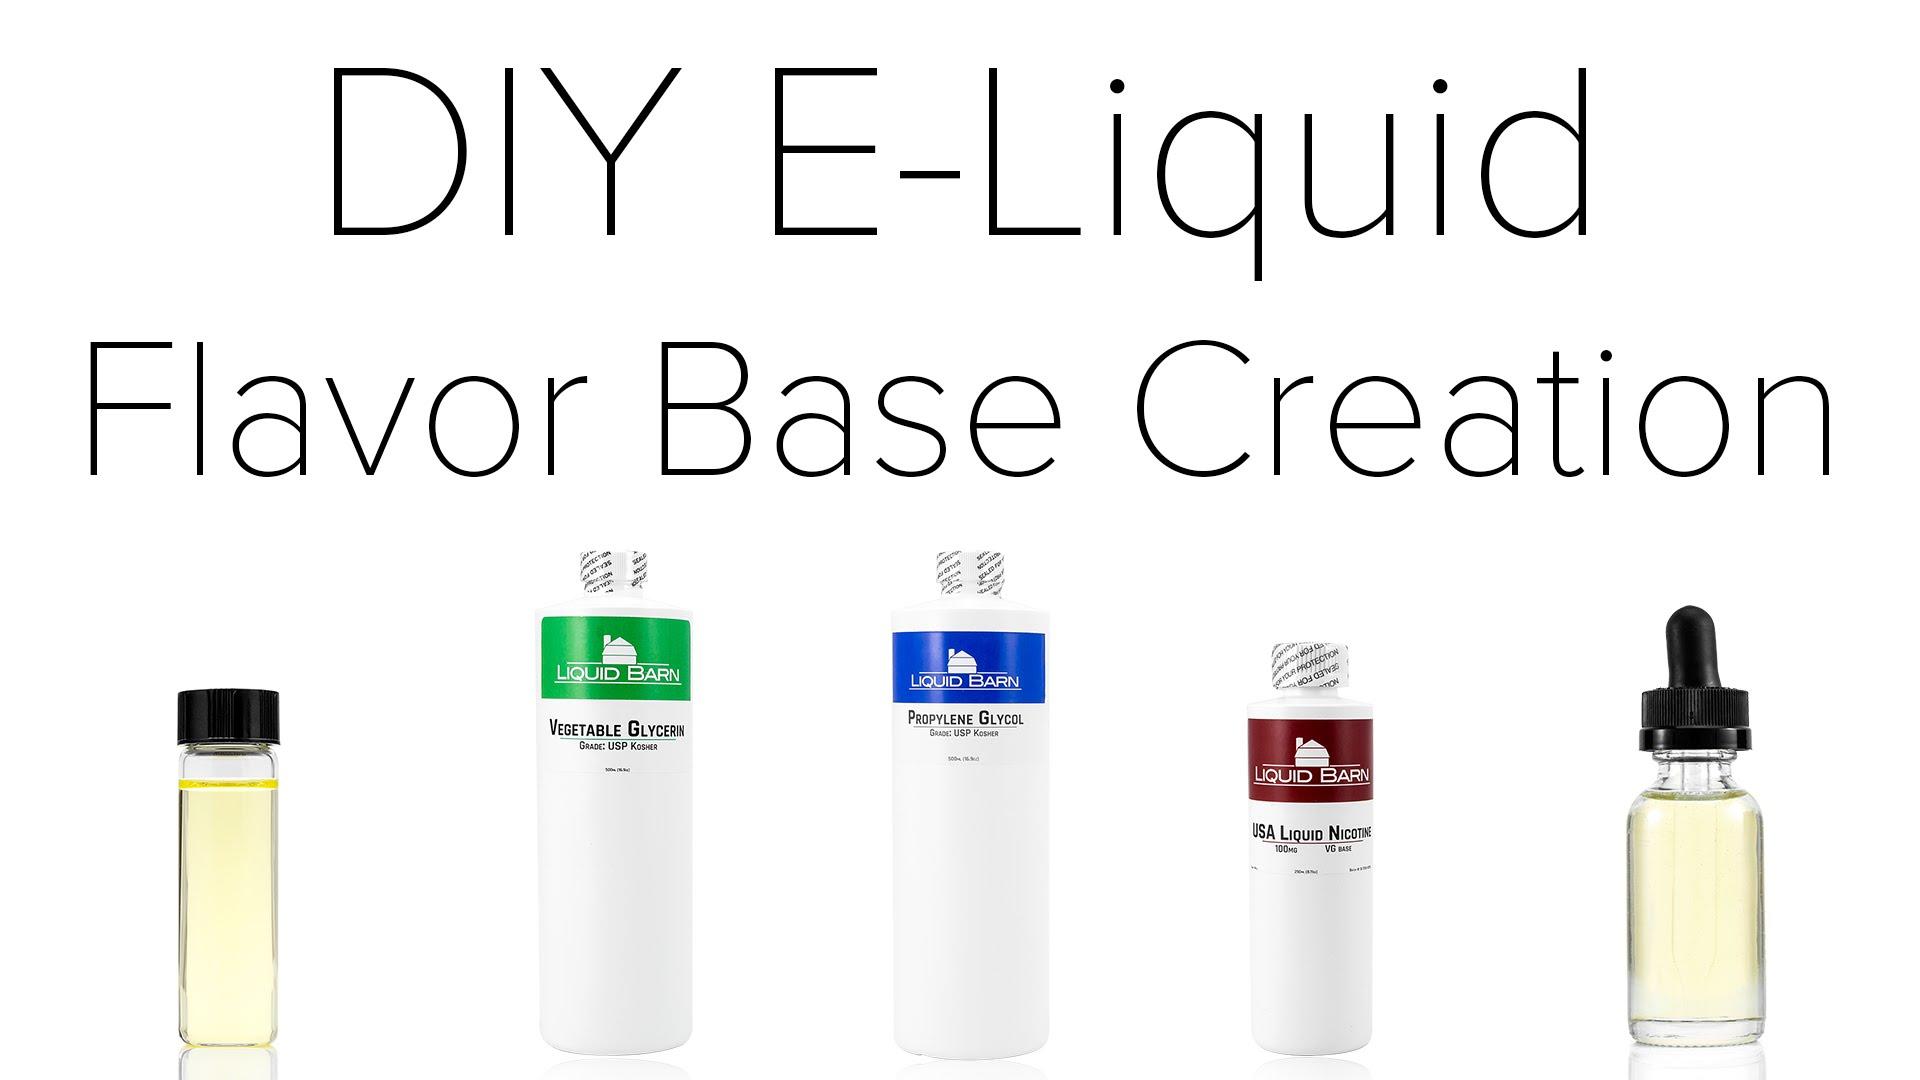 Diy e liquid vape juice recipes diy e liquid solutioingenieria Images